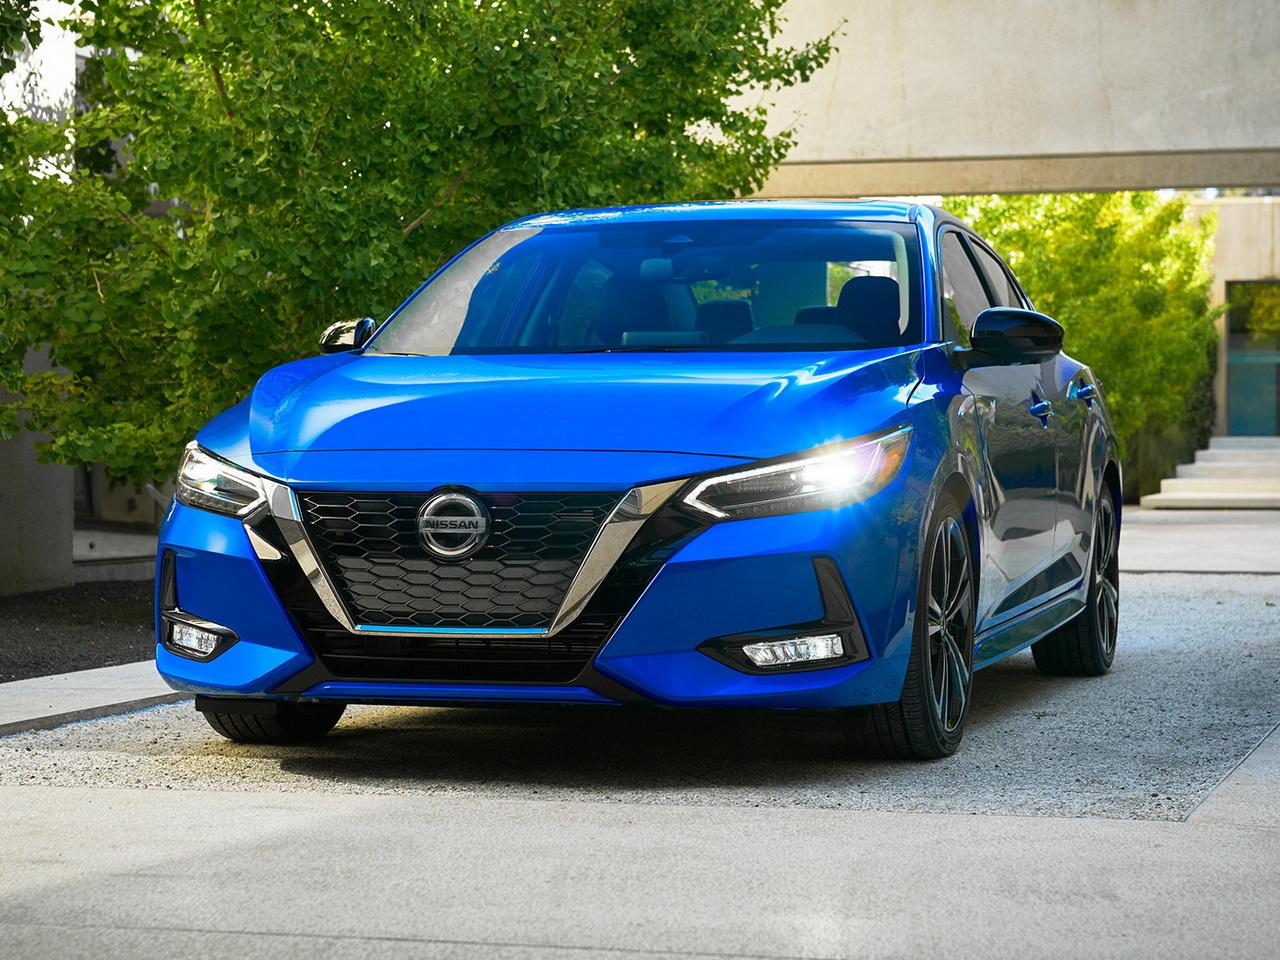 Новый Nissan Sentra 2020 - фото, цена и техника седана